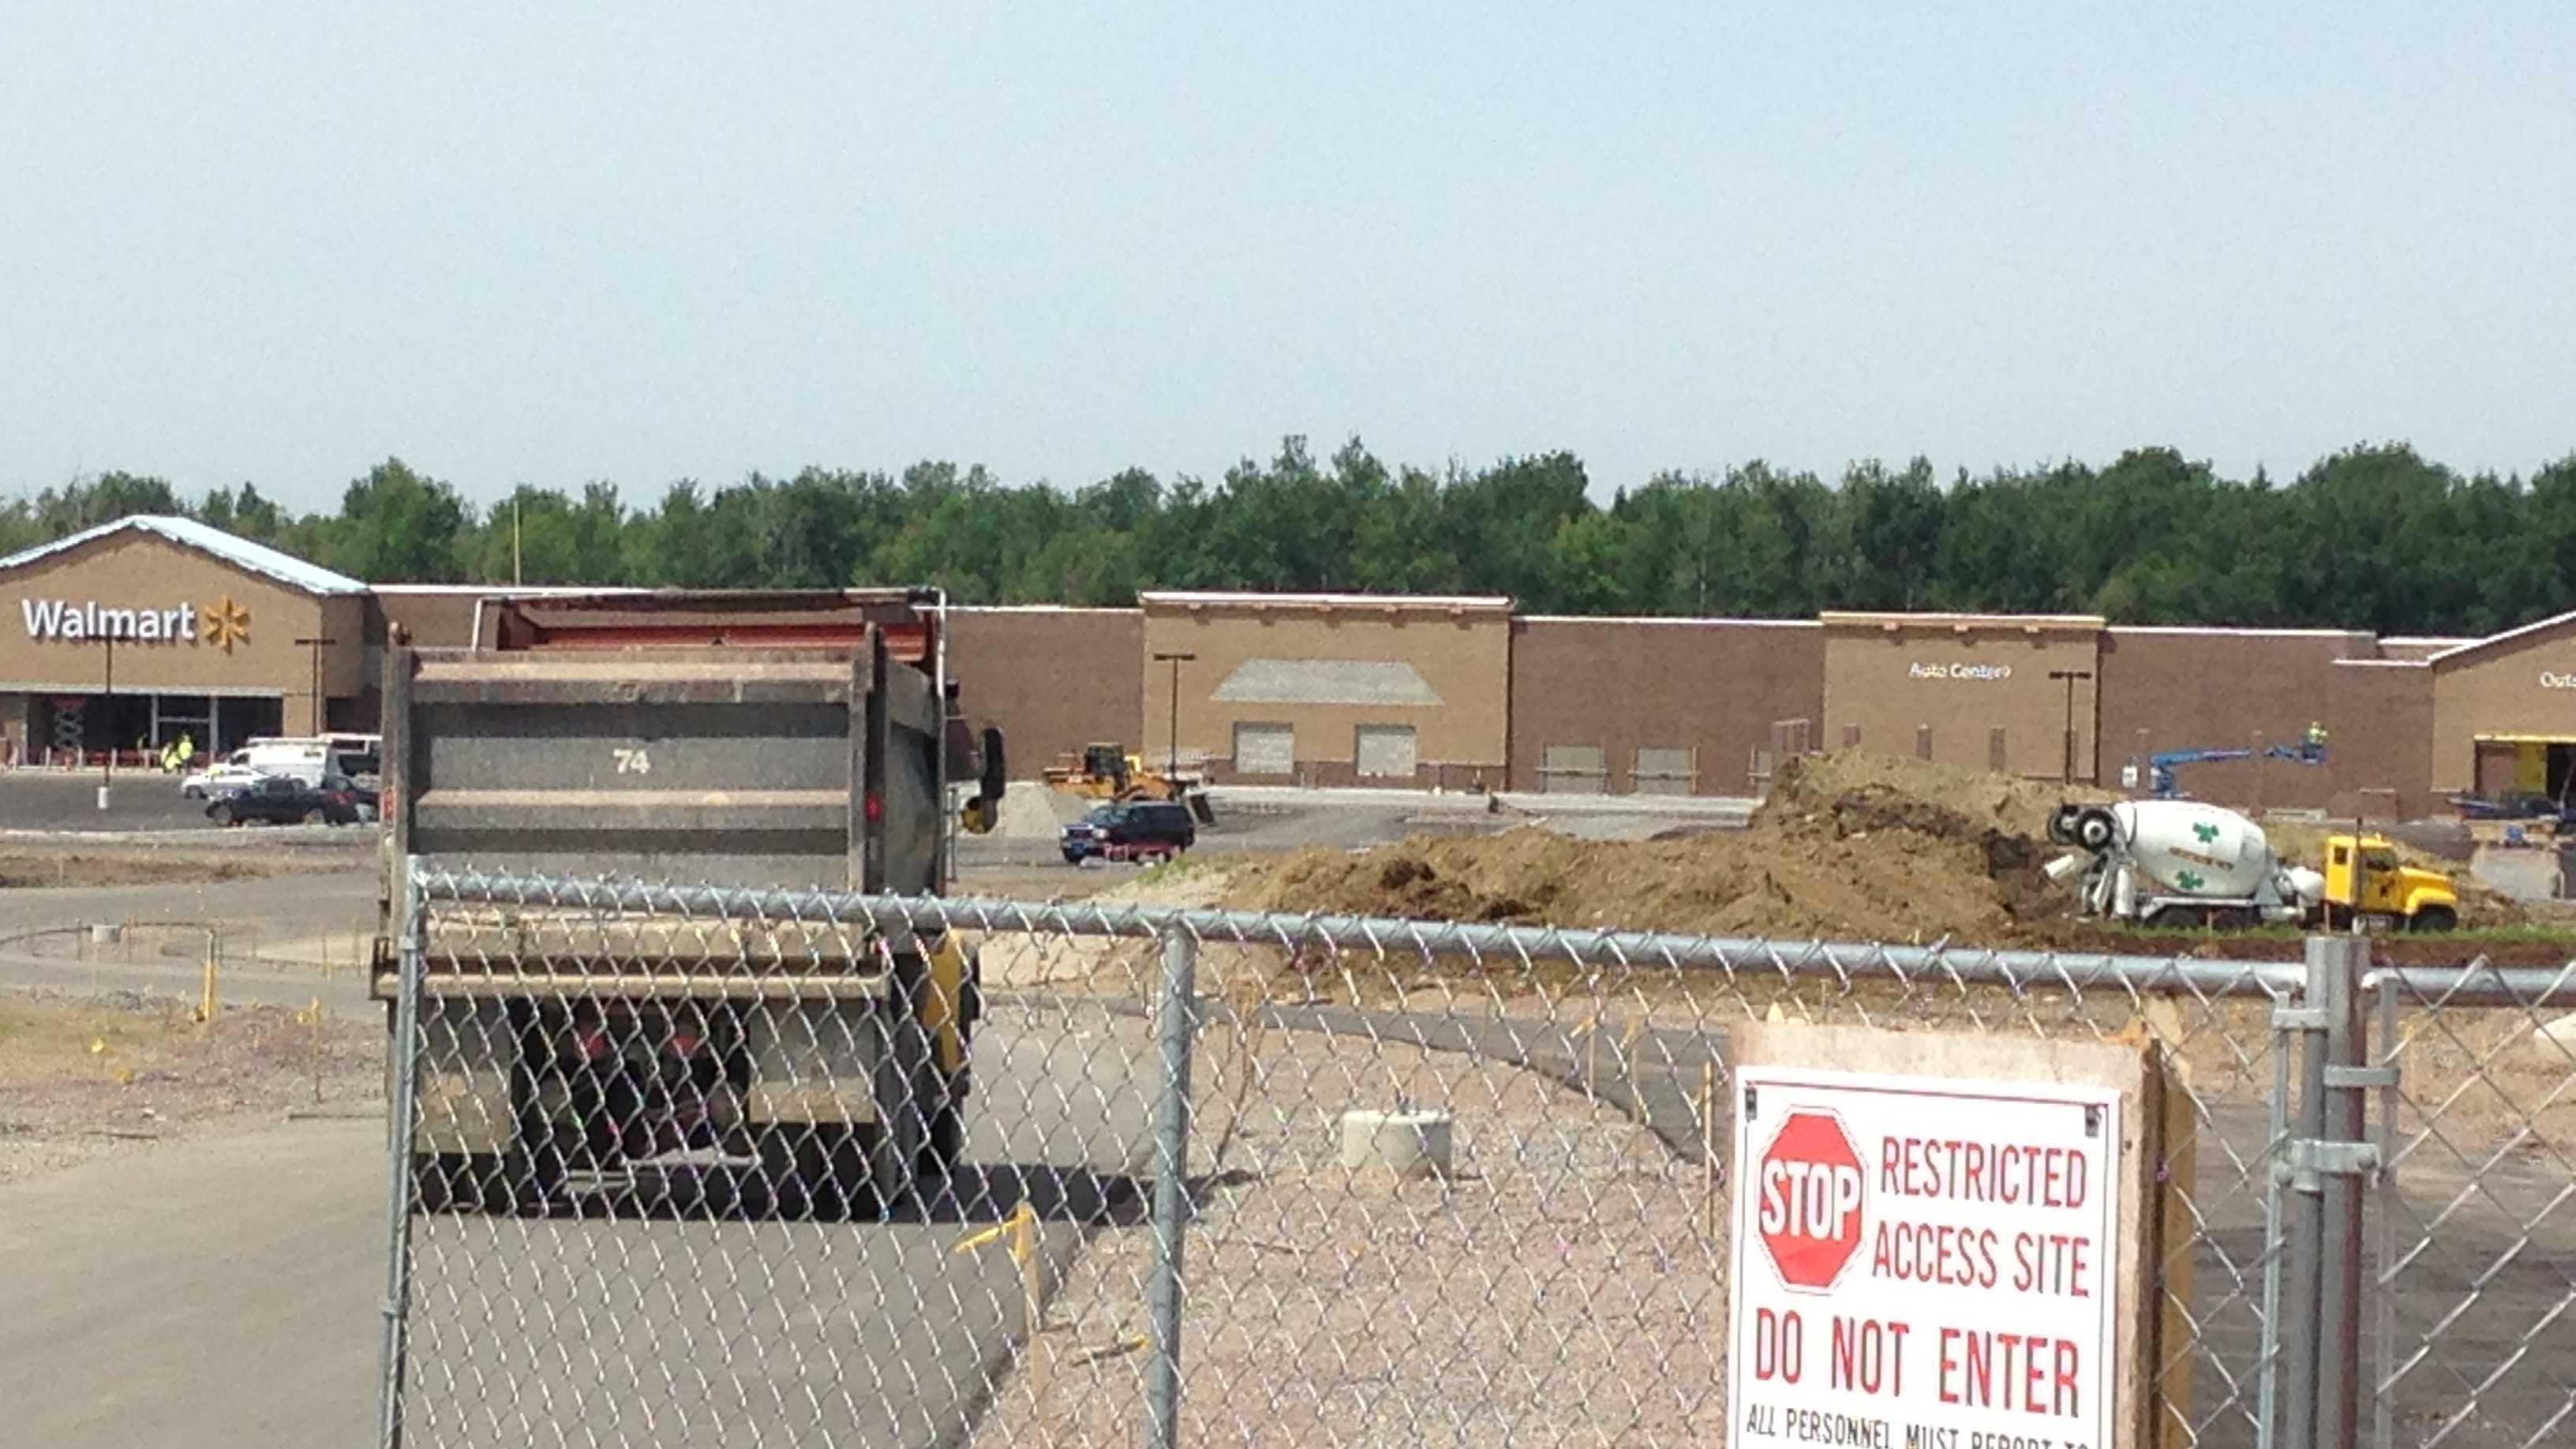 07-12-13 St.A Walmart under construction -img